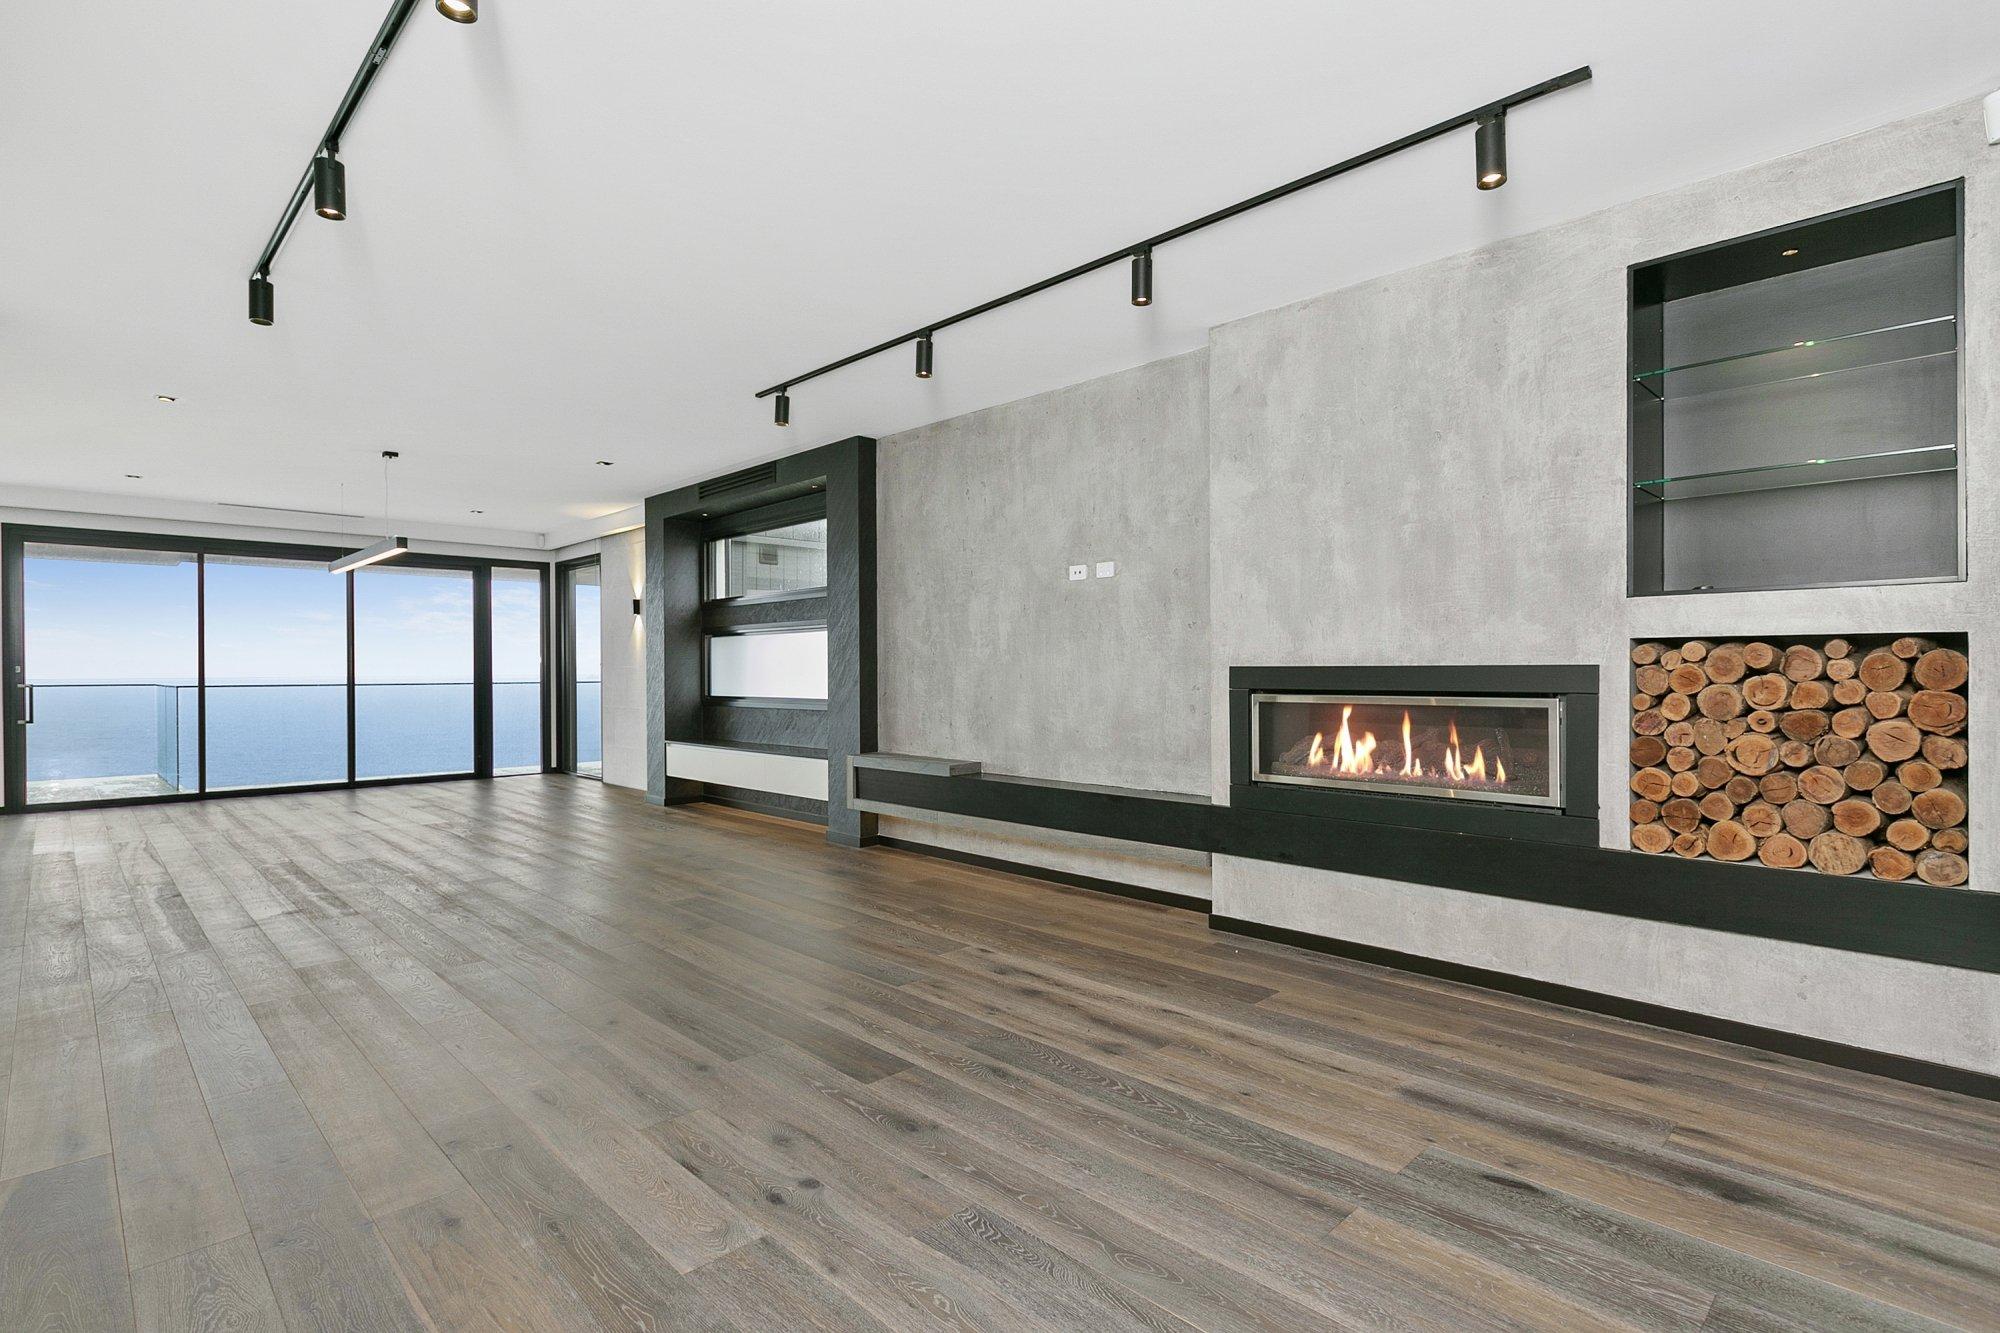 Rental Home with Beach views Mornington Peninsula